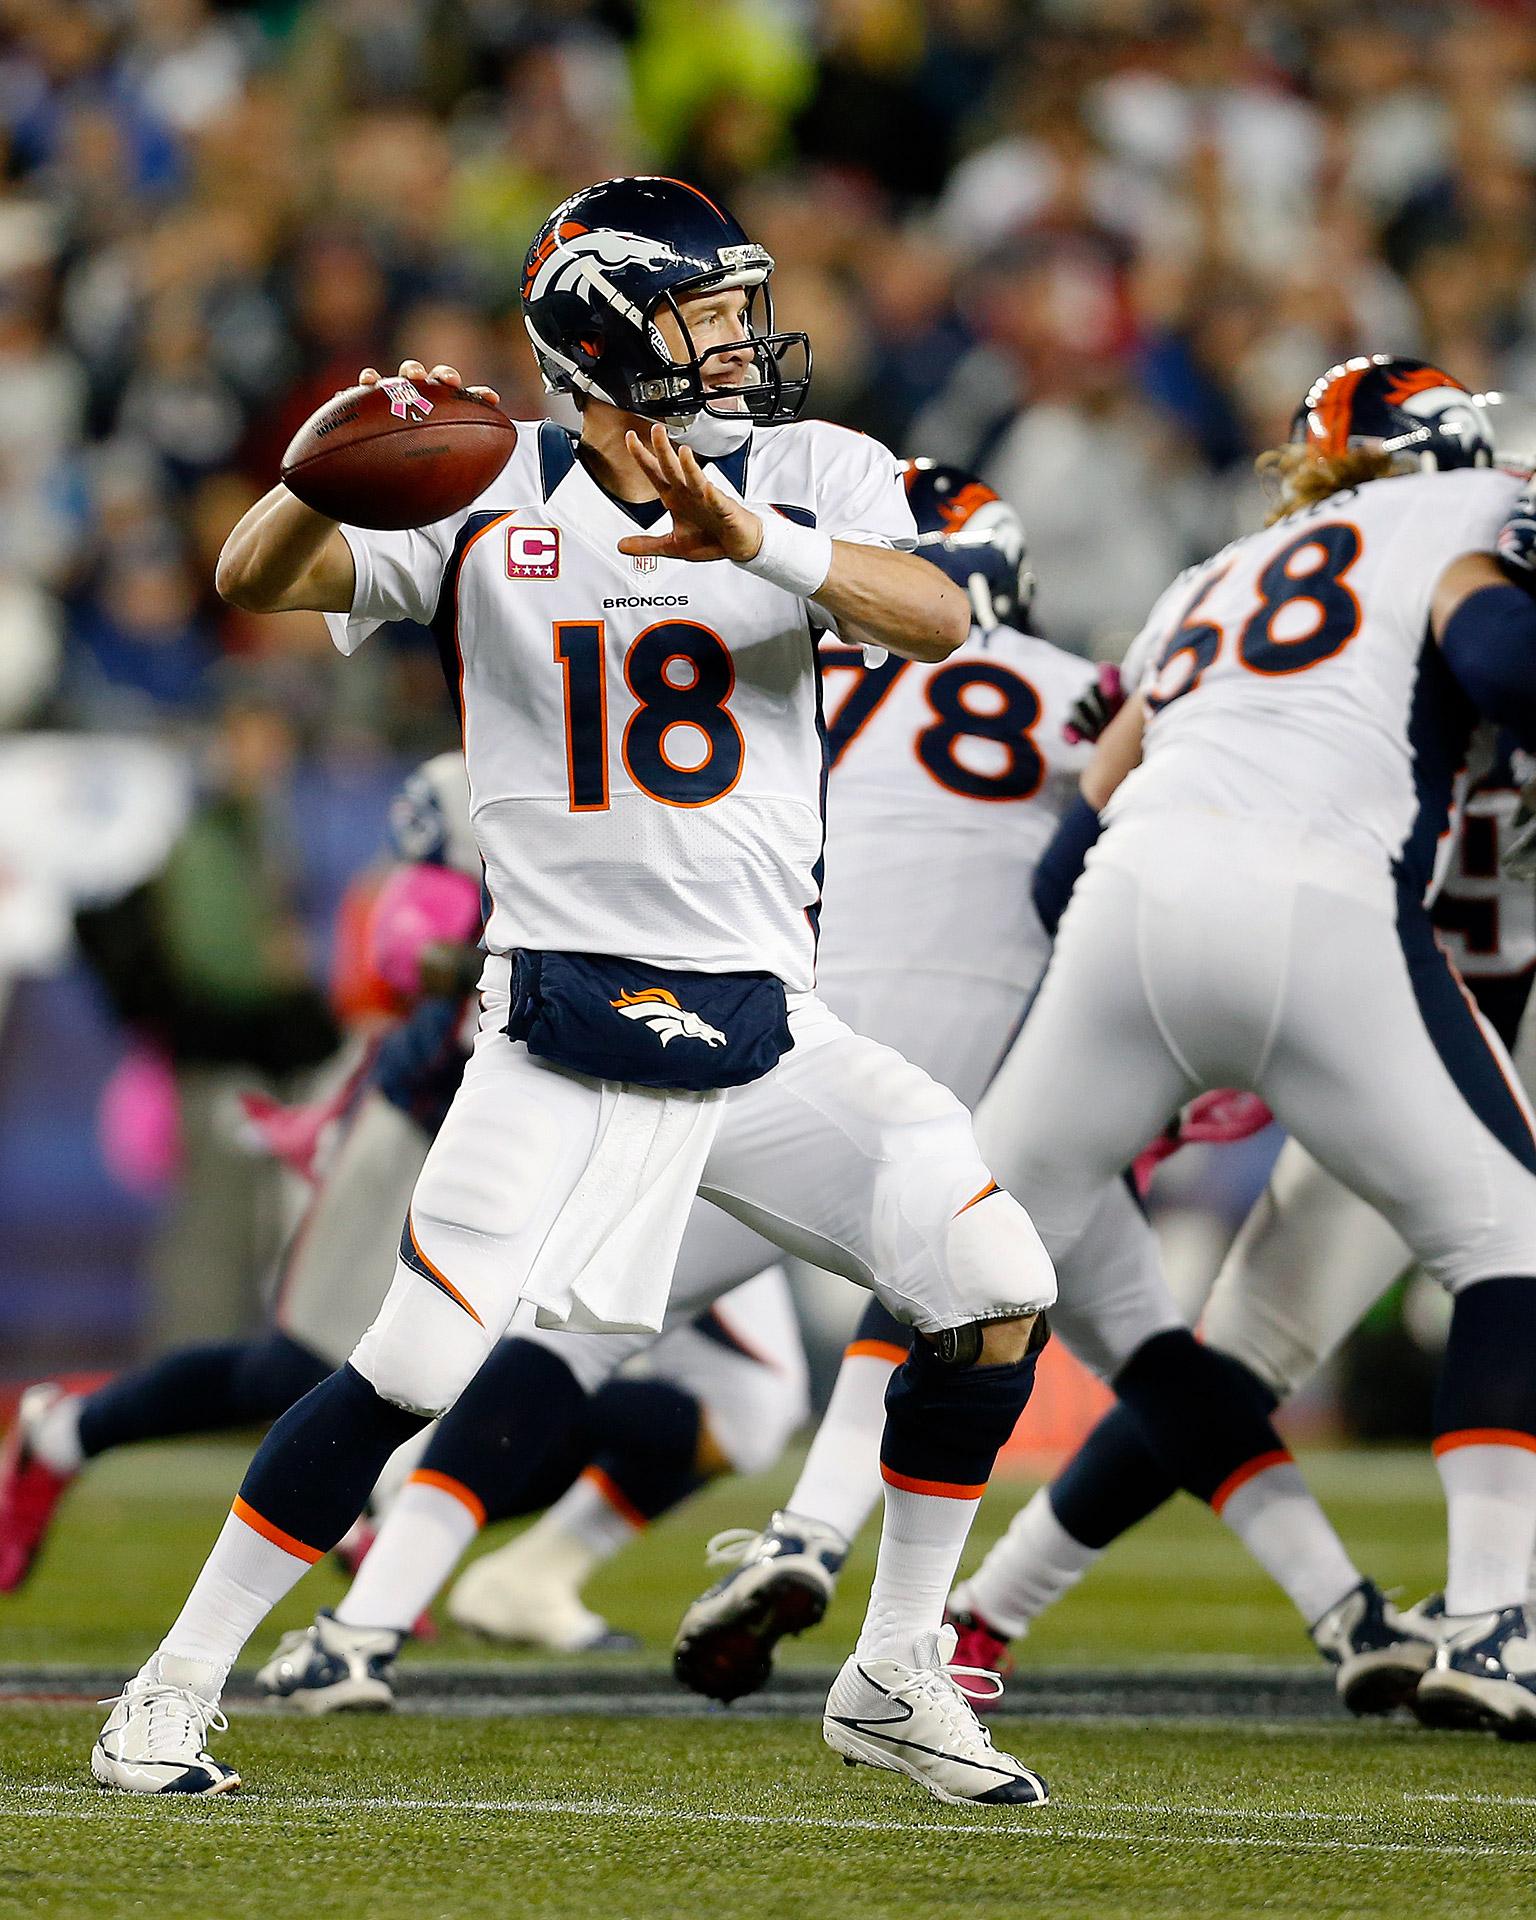 Oct. 7, 2012: Patriots 31, Broncos 21